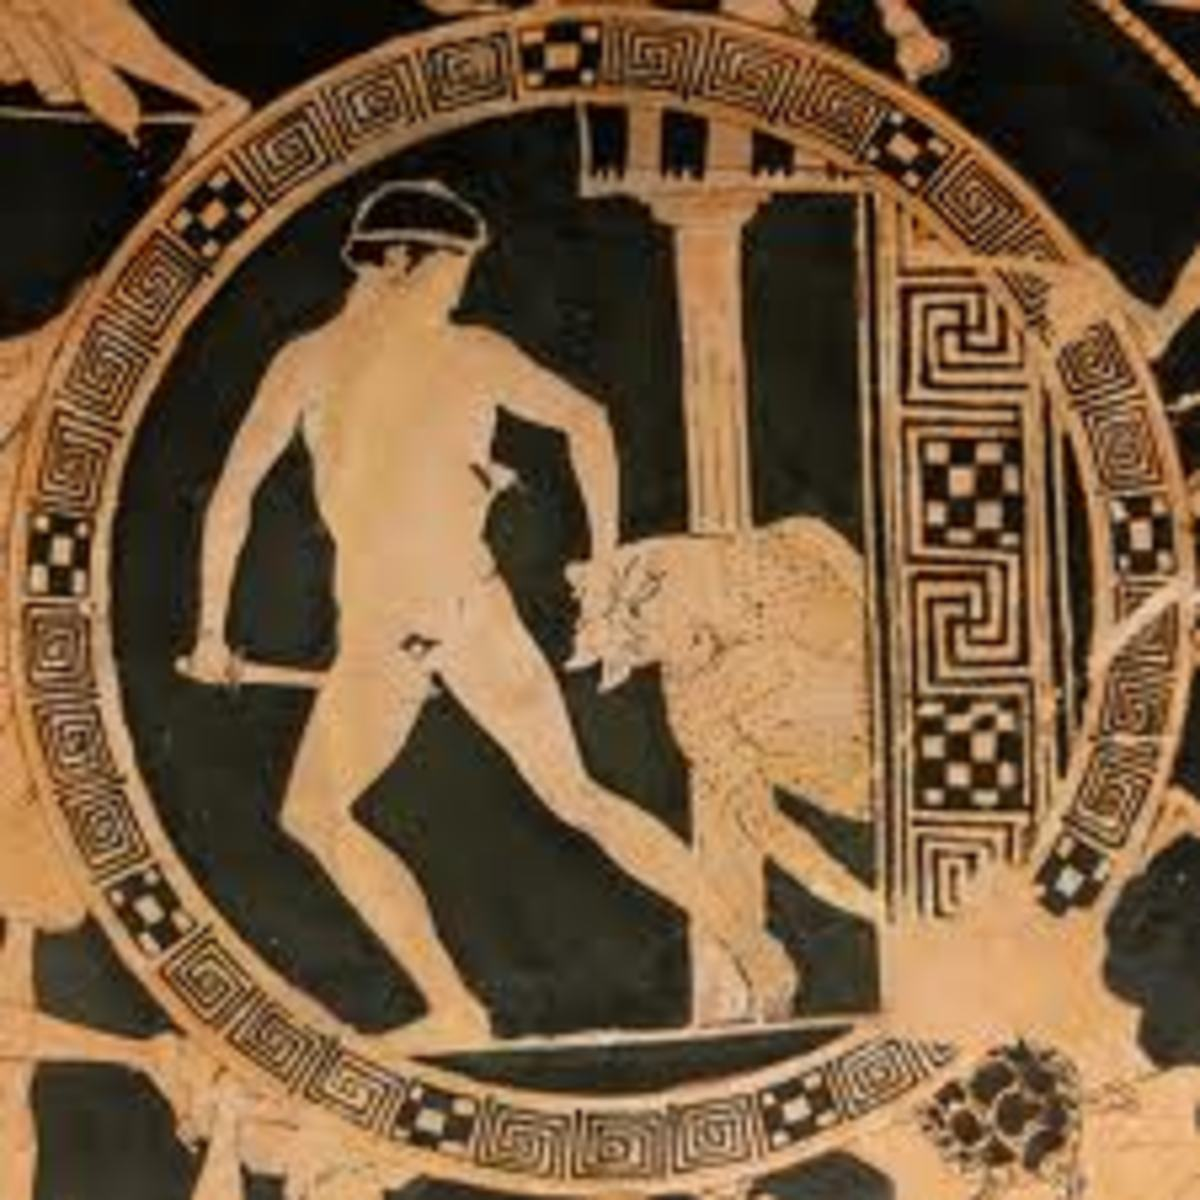 Theseus and Minotauros on vase